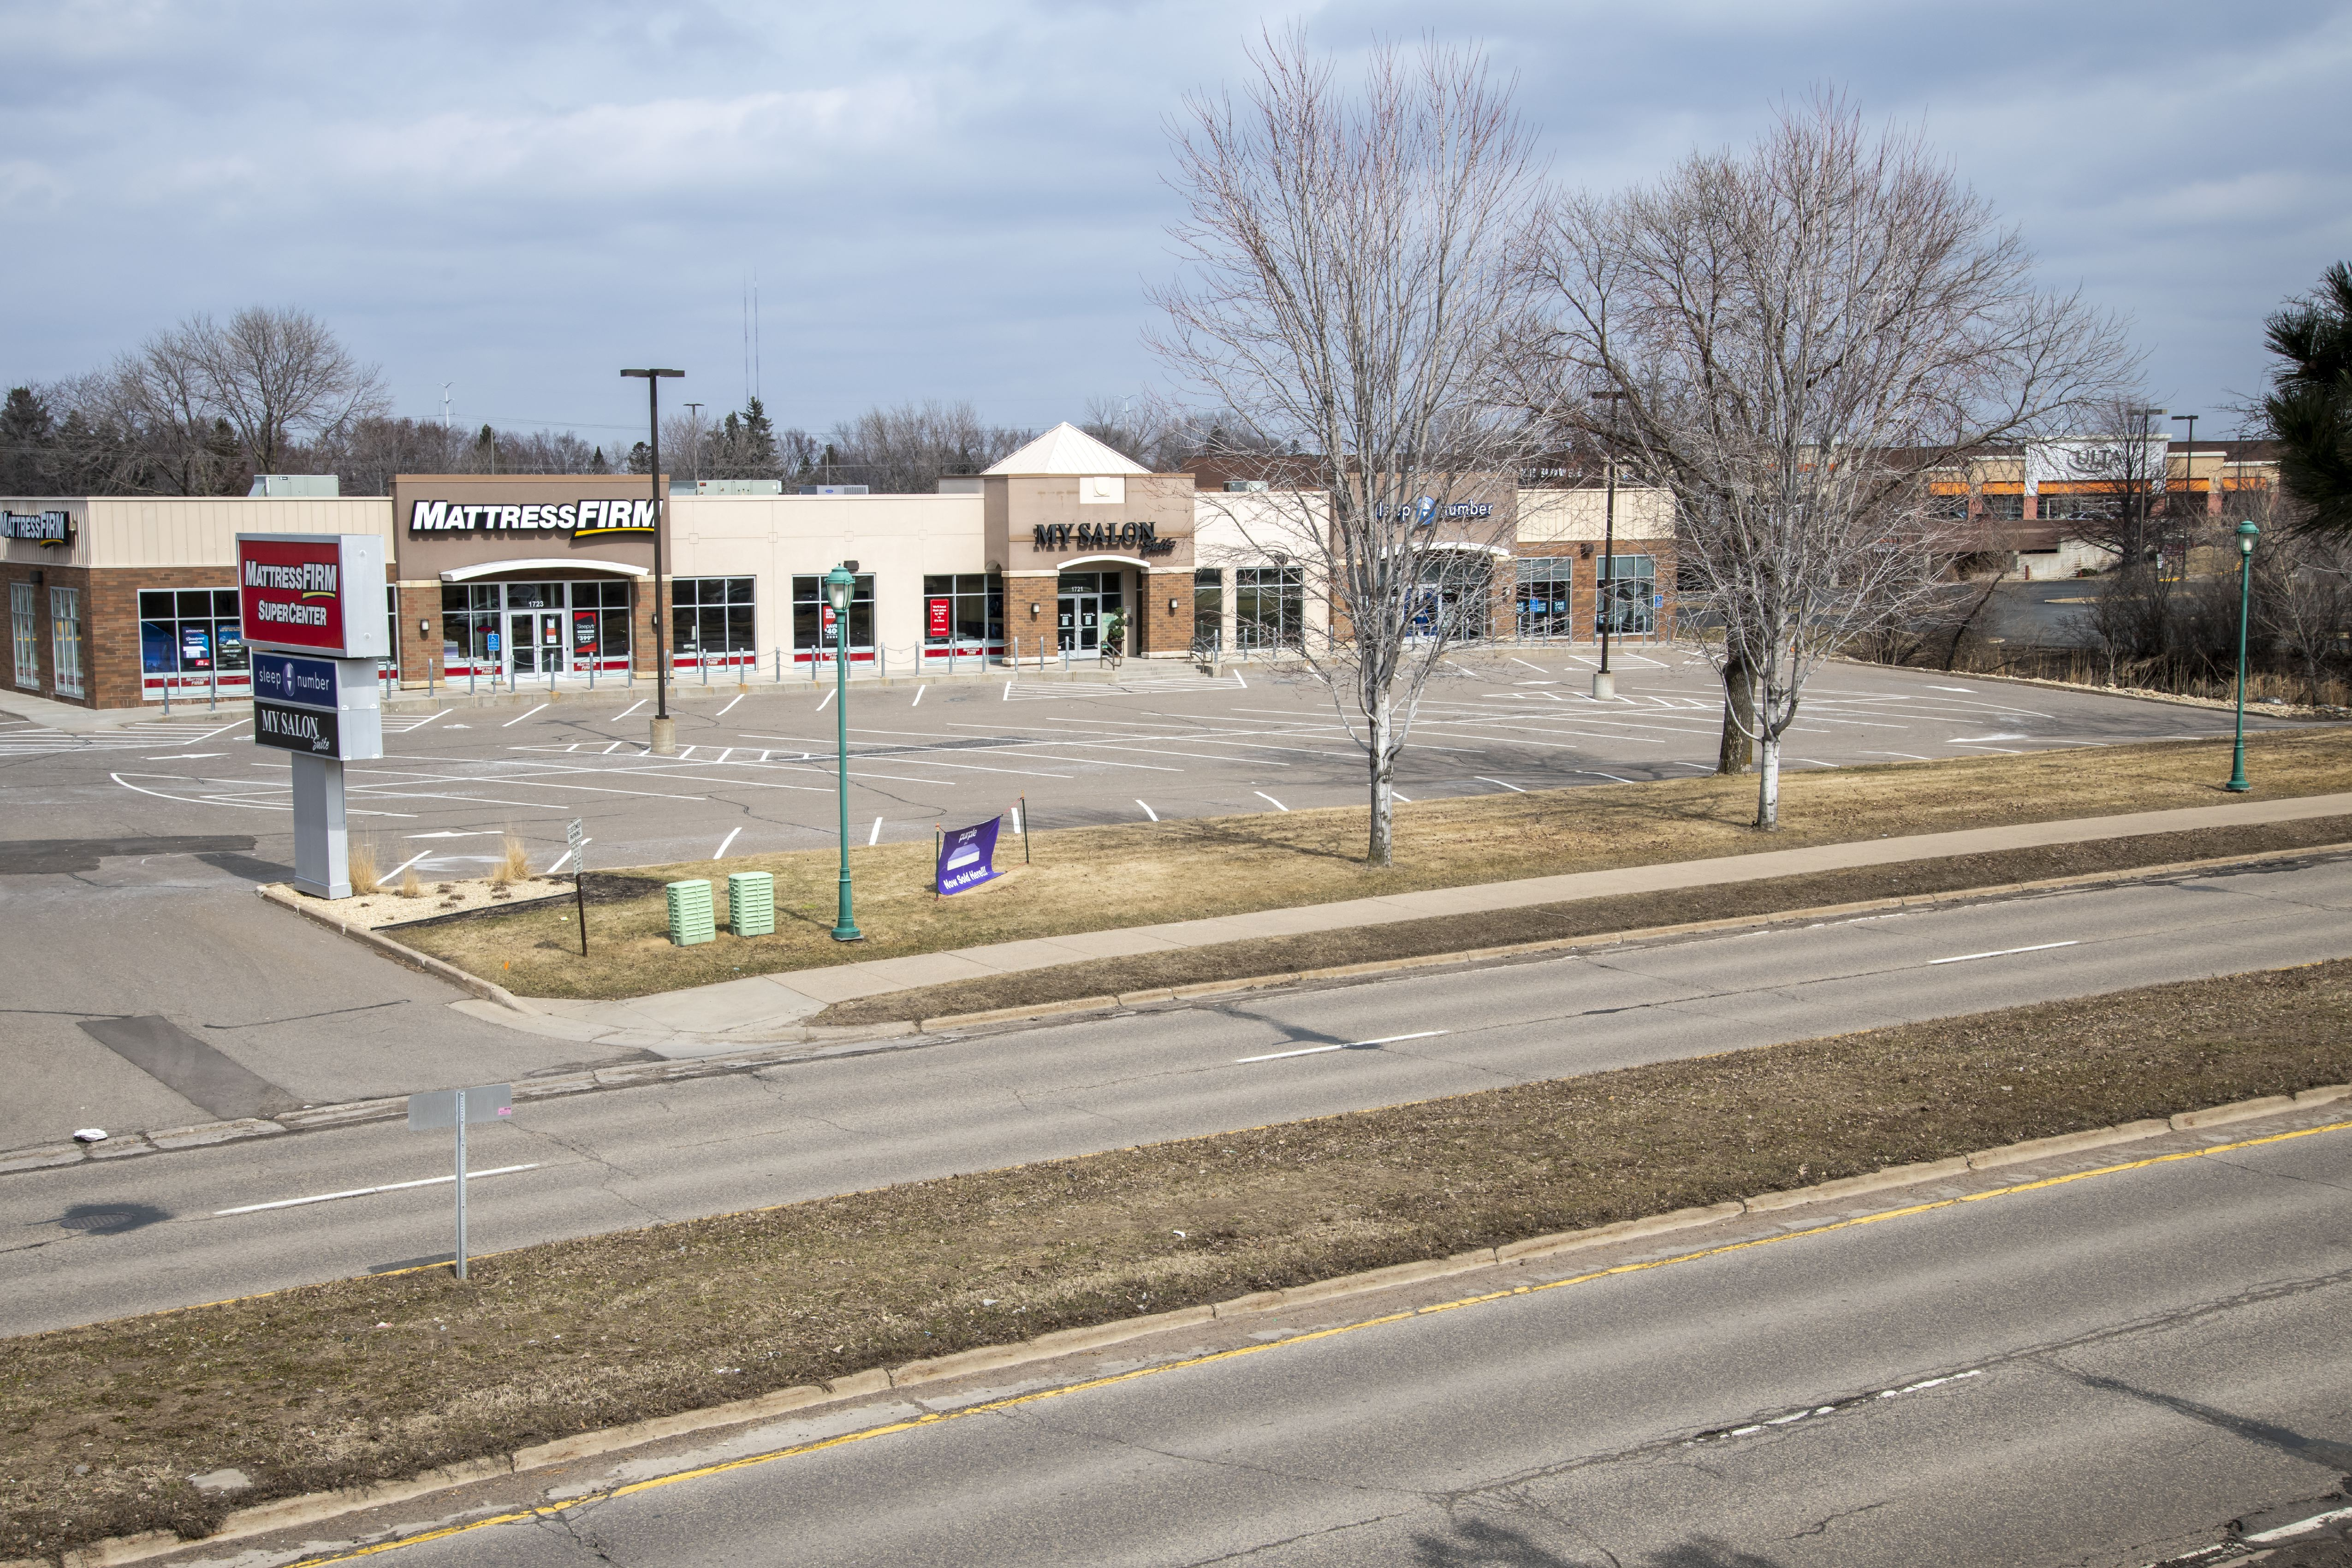 Empty strip mall because of the shutdown from the coronavirus pandemic, Roseville, Minnesota.